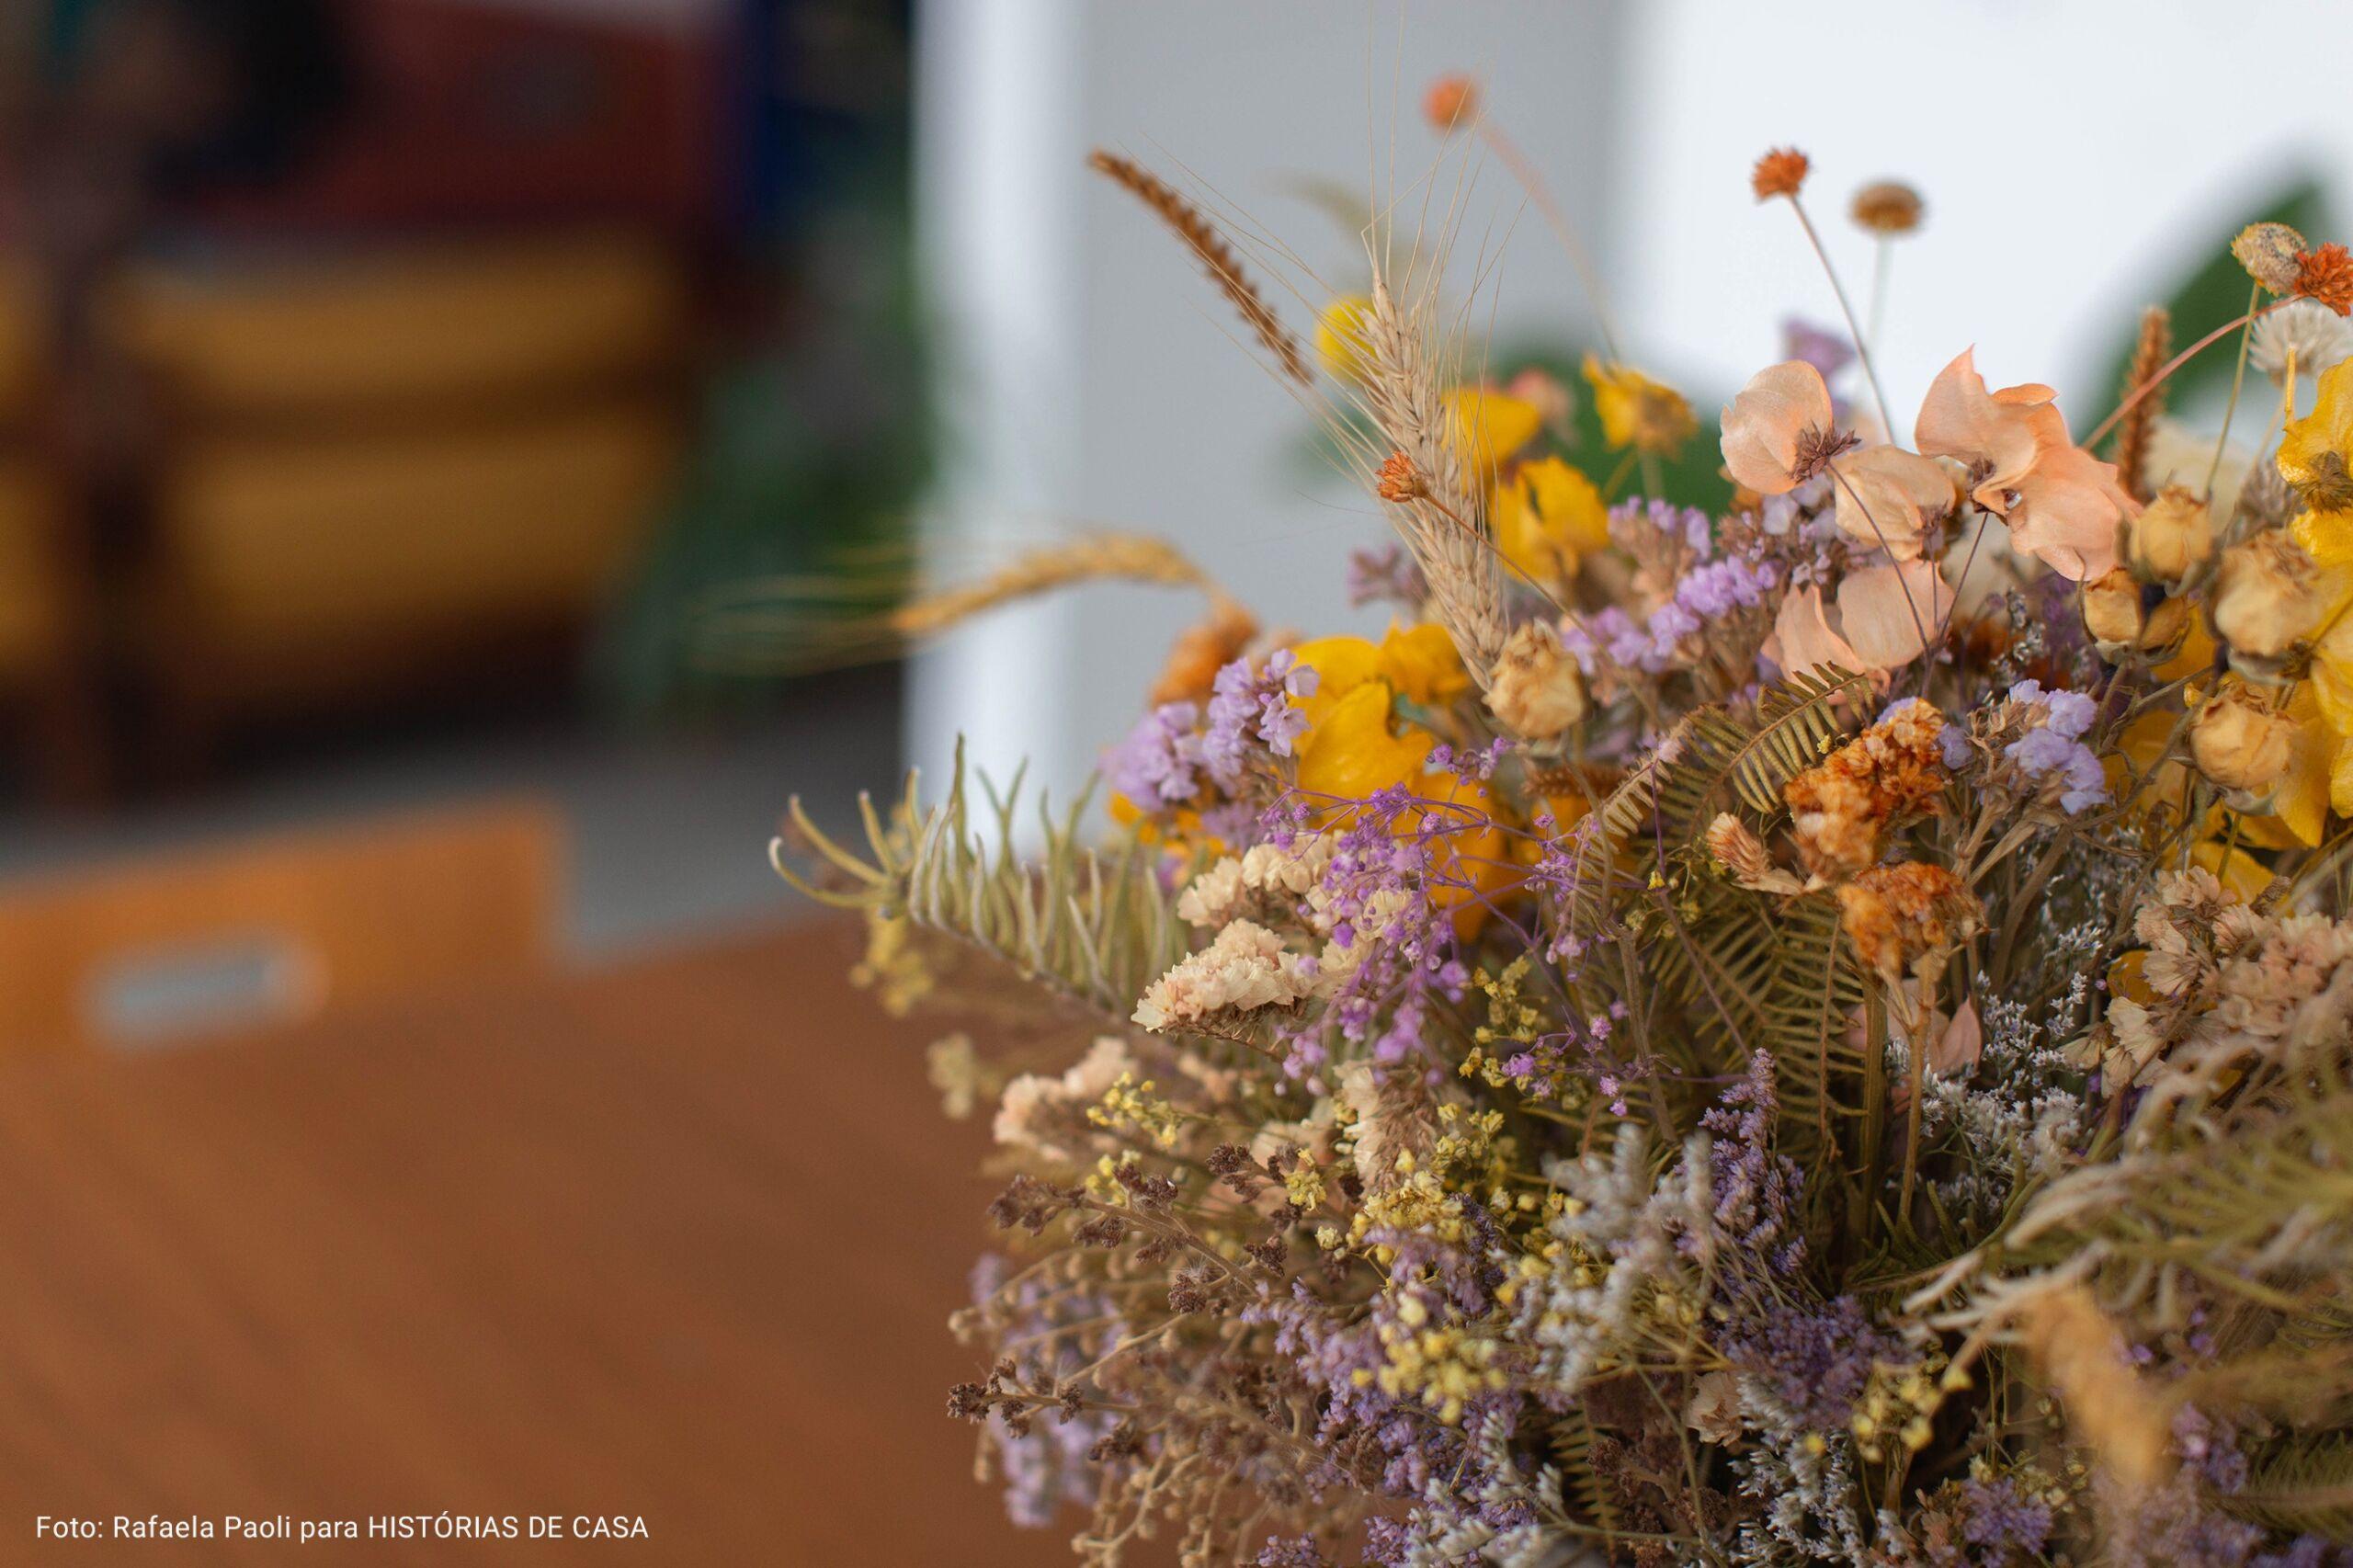 arranjo de flores encima da mesa